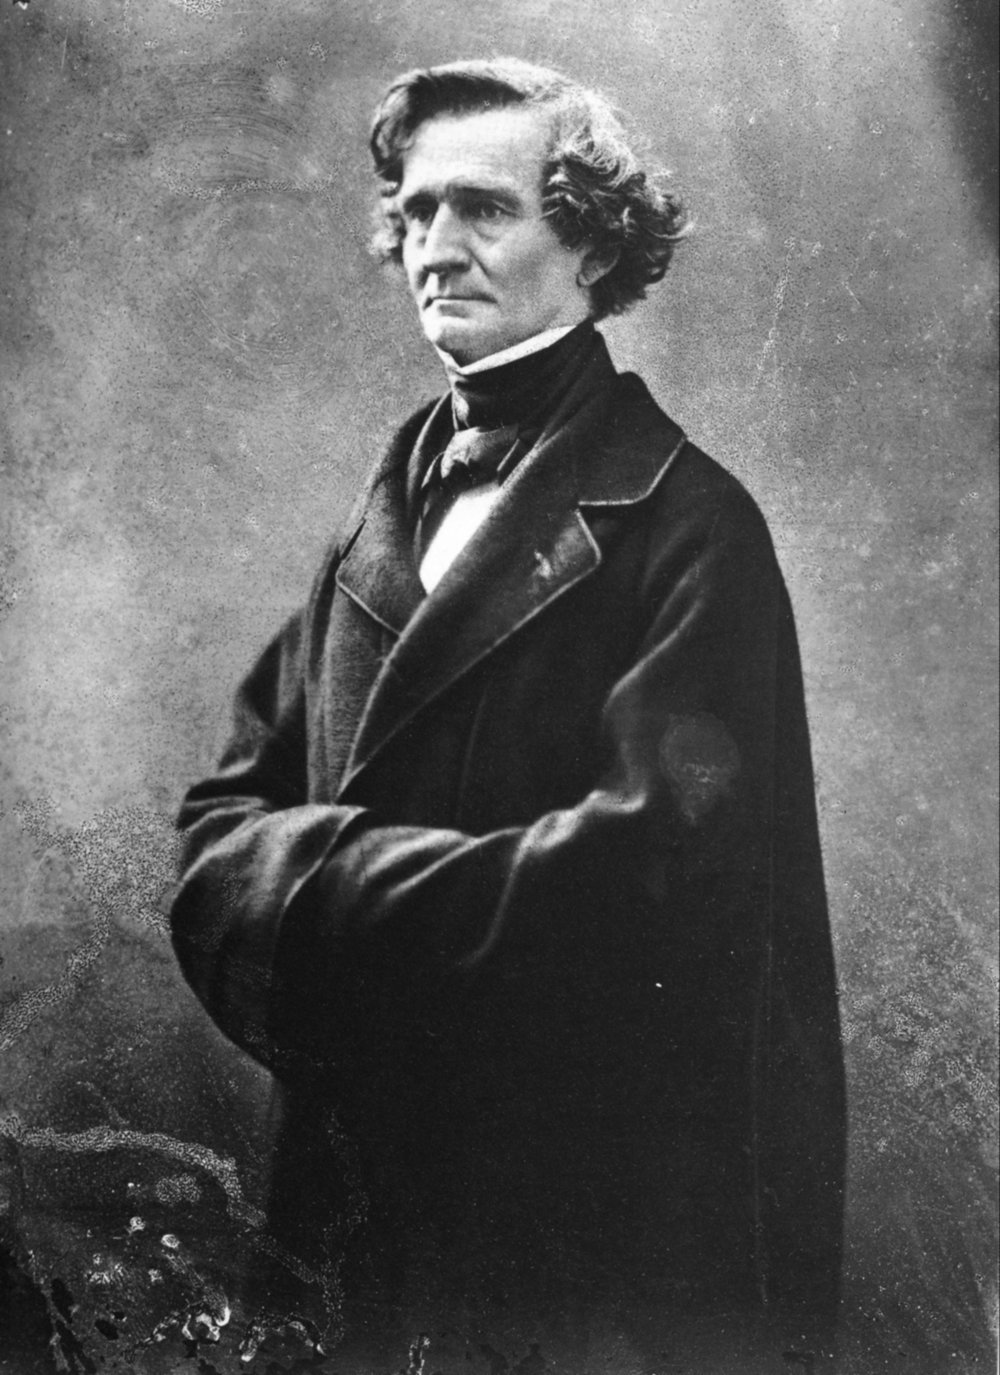 Félix_Nadar_1820-1910_portraits_Hector_Berlioz.jpg